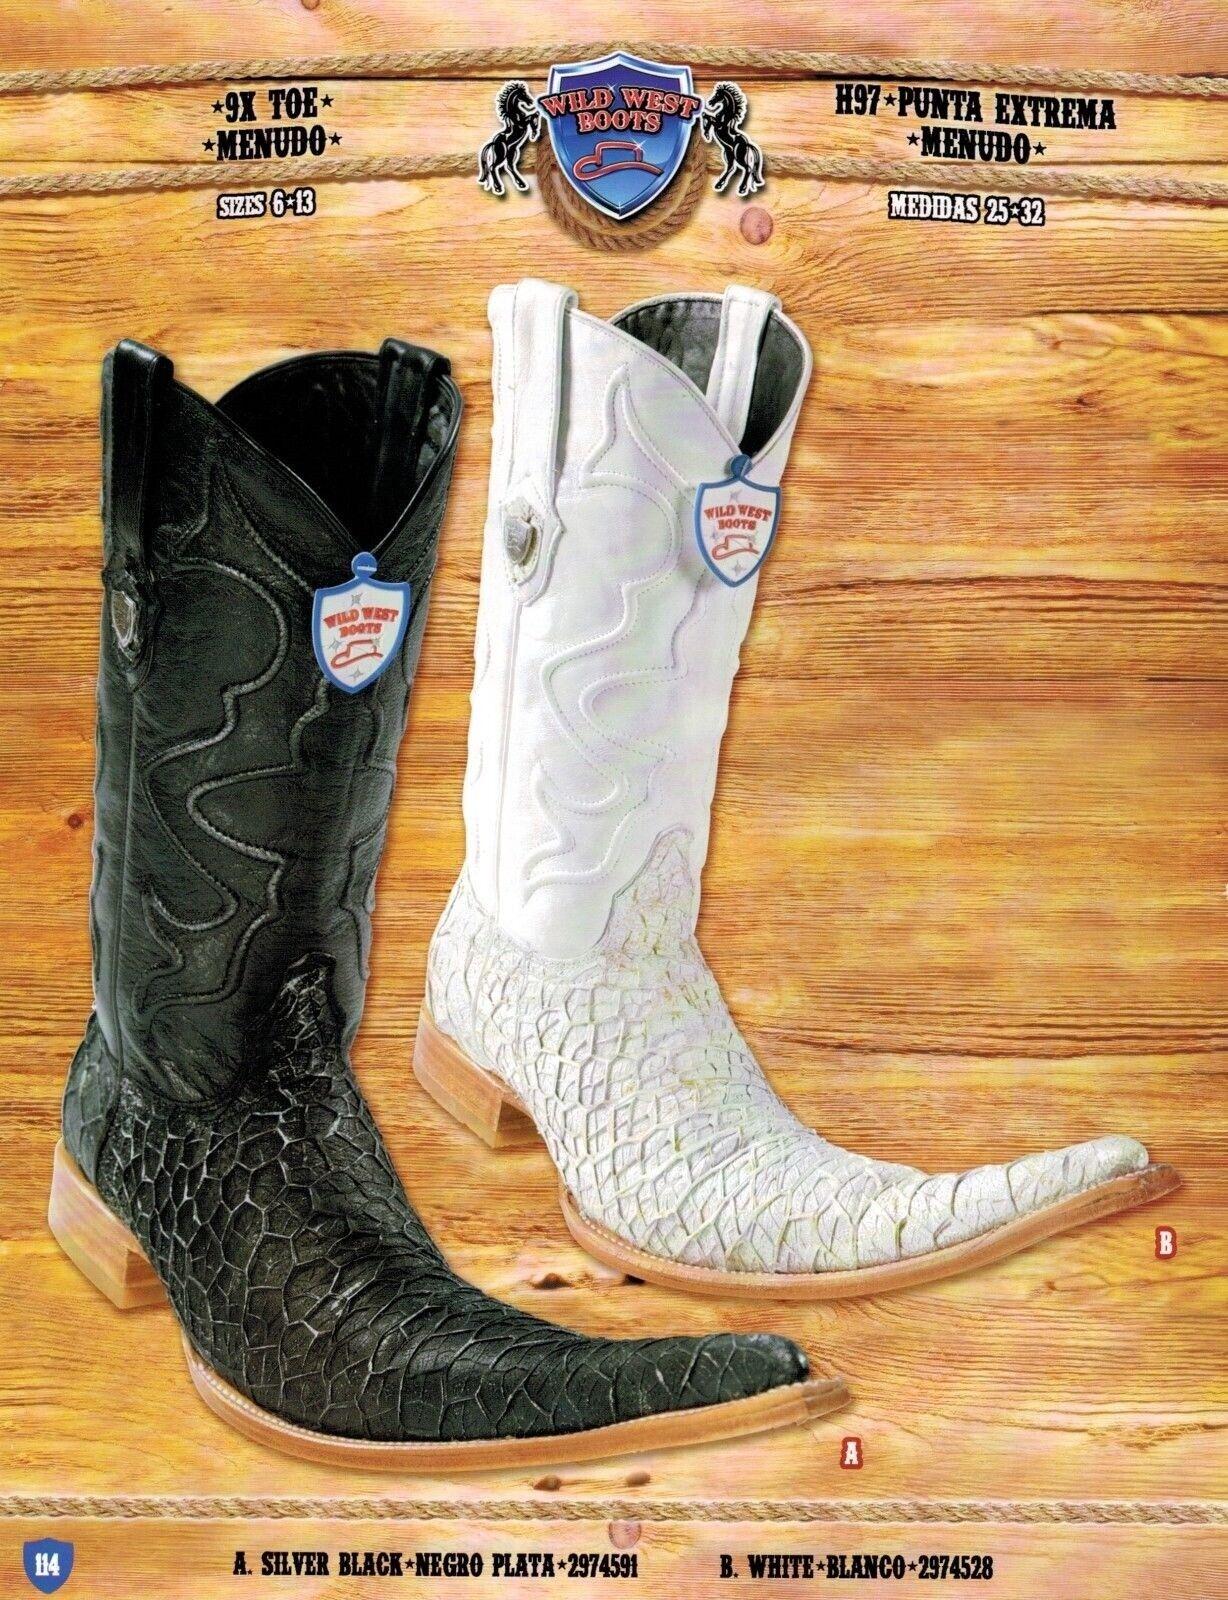 Wild West Men's 9X-Toe Menudo Cowboy Western Boots Different colors